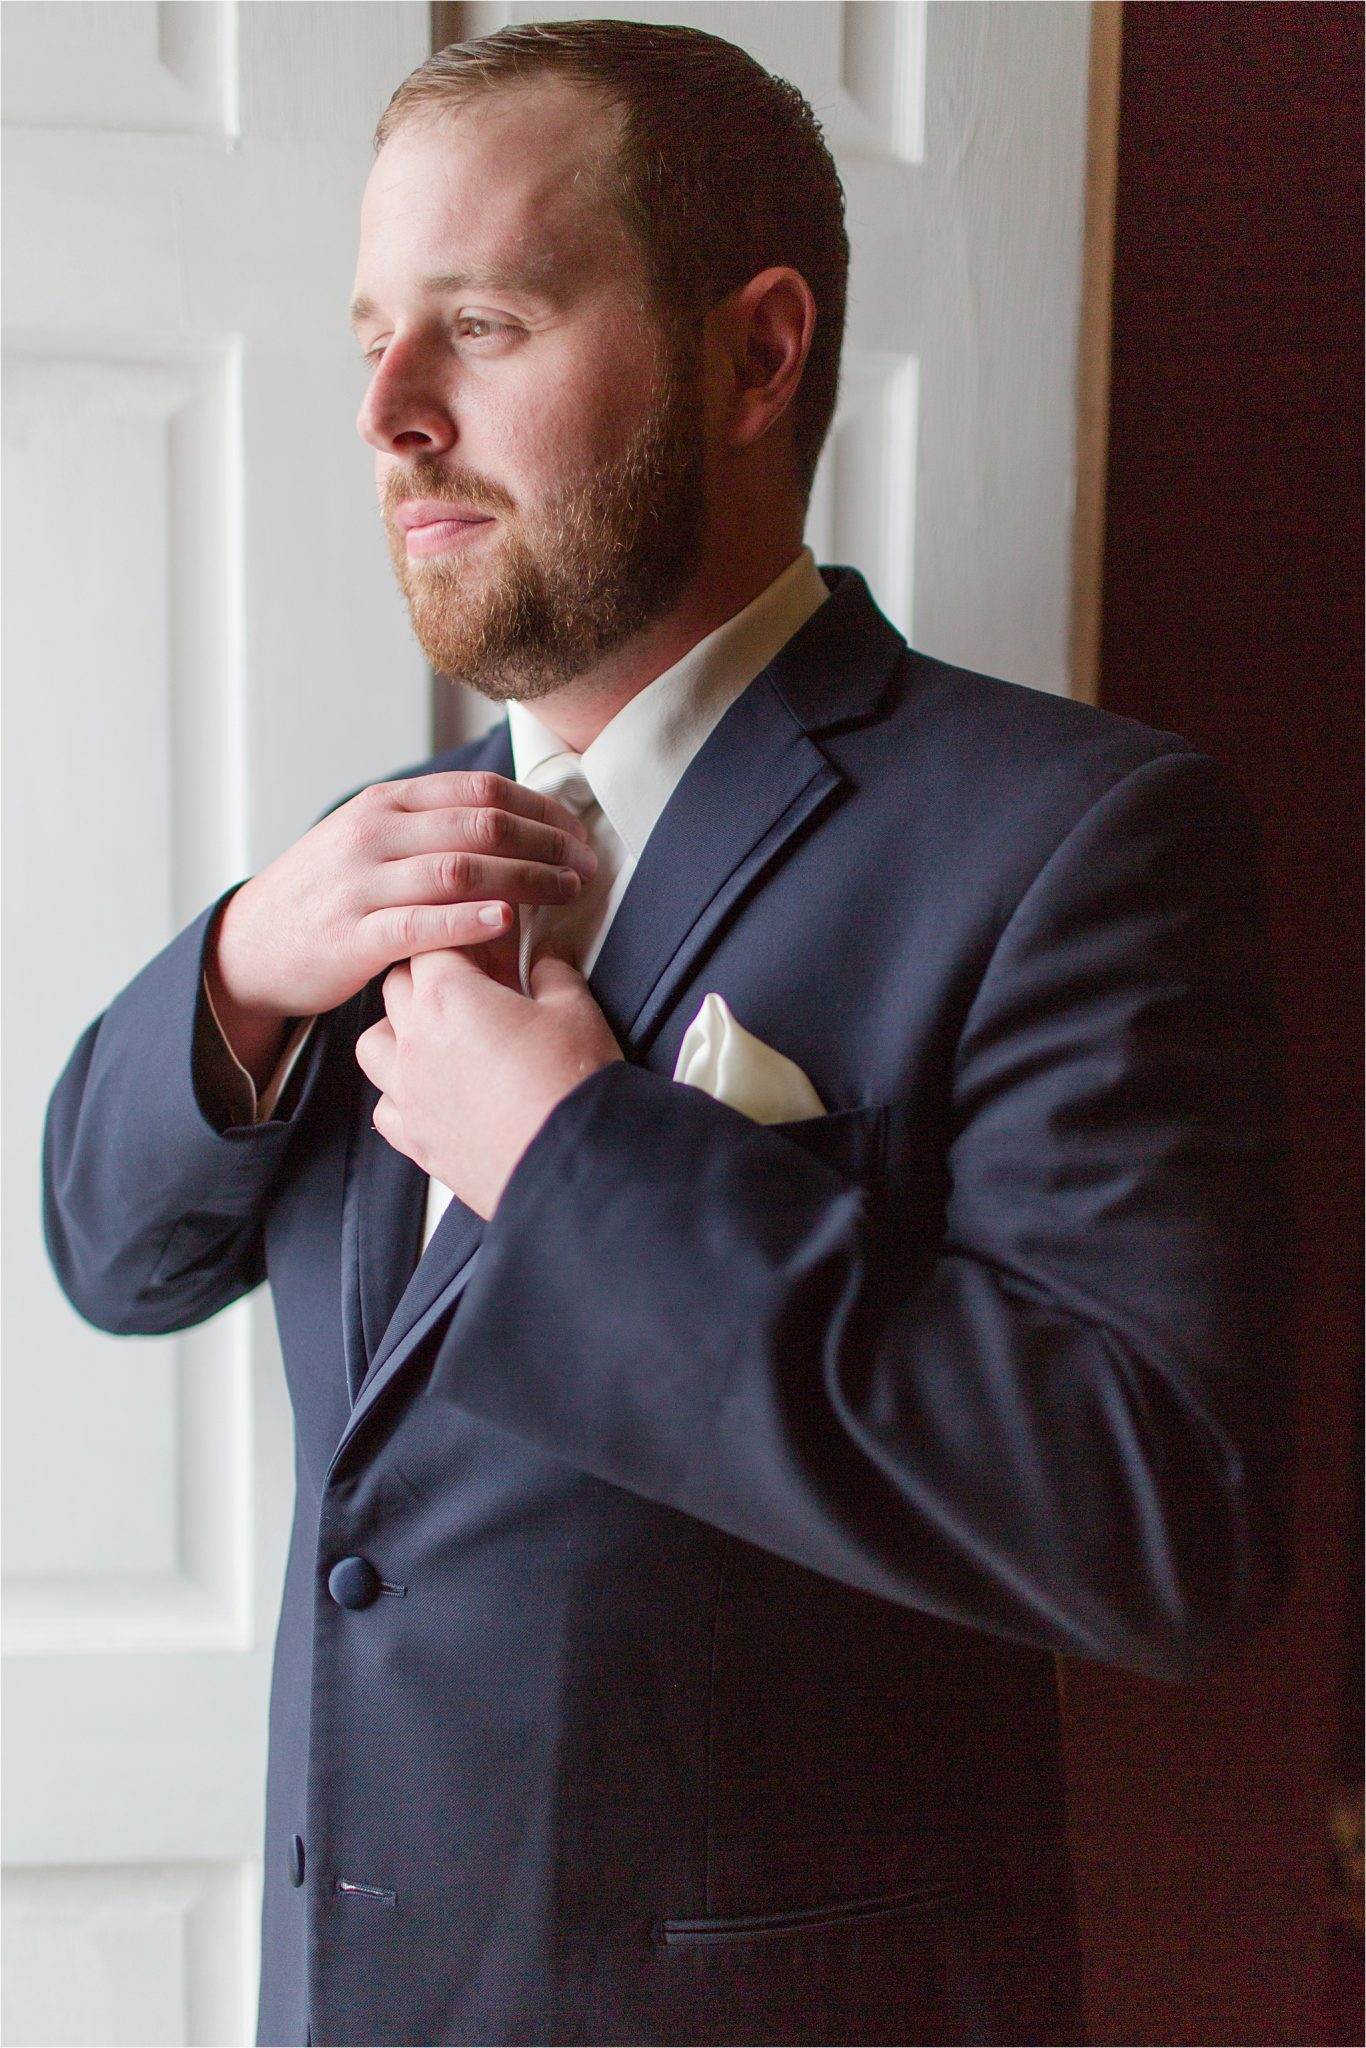 Groom-beard-navy suit-redhead-ivory handkerchief